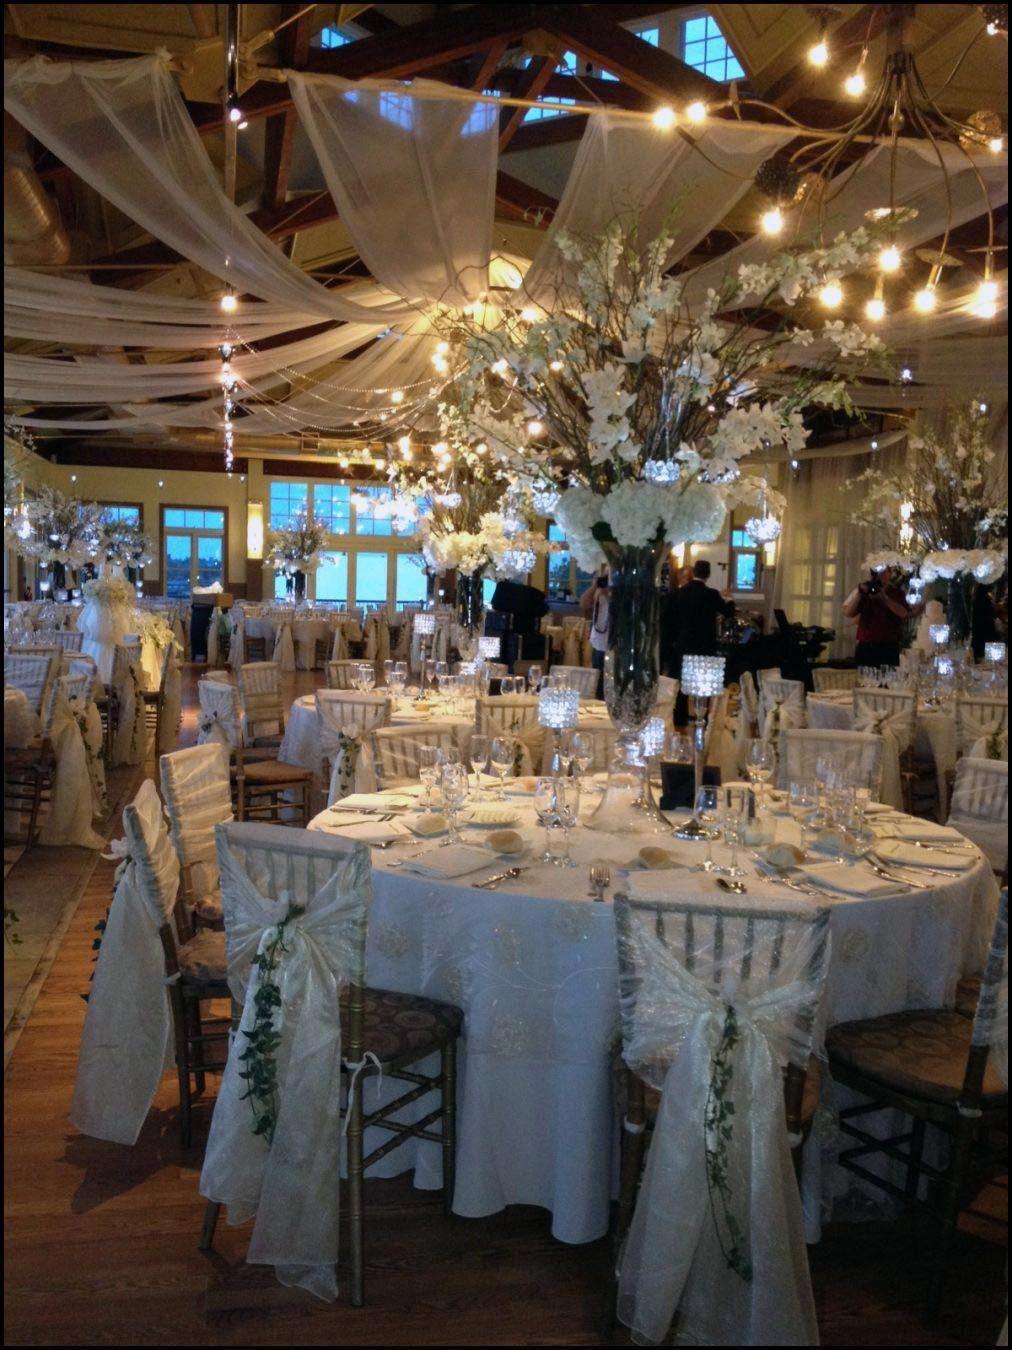 Luxurious Wedding Reception Halls Near Me Chicago Wedding Venues Luxury Wedding Venues Illinois Wedding Venues